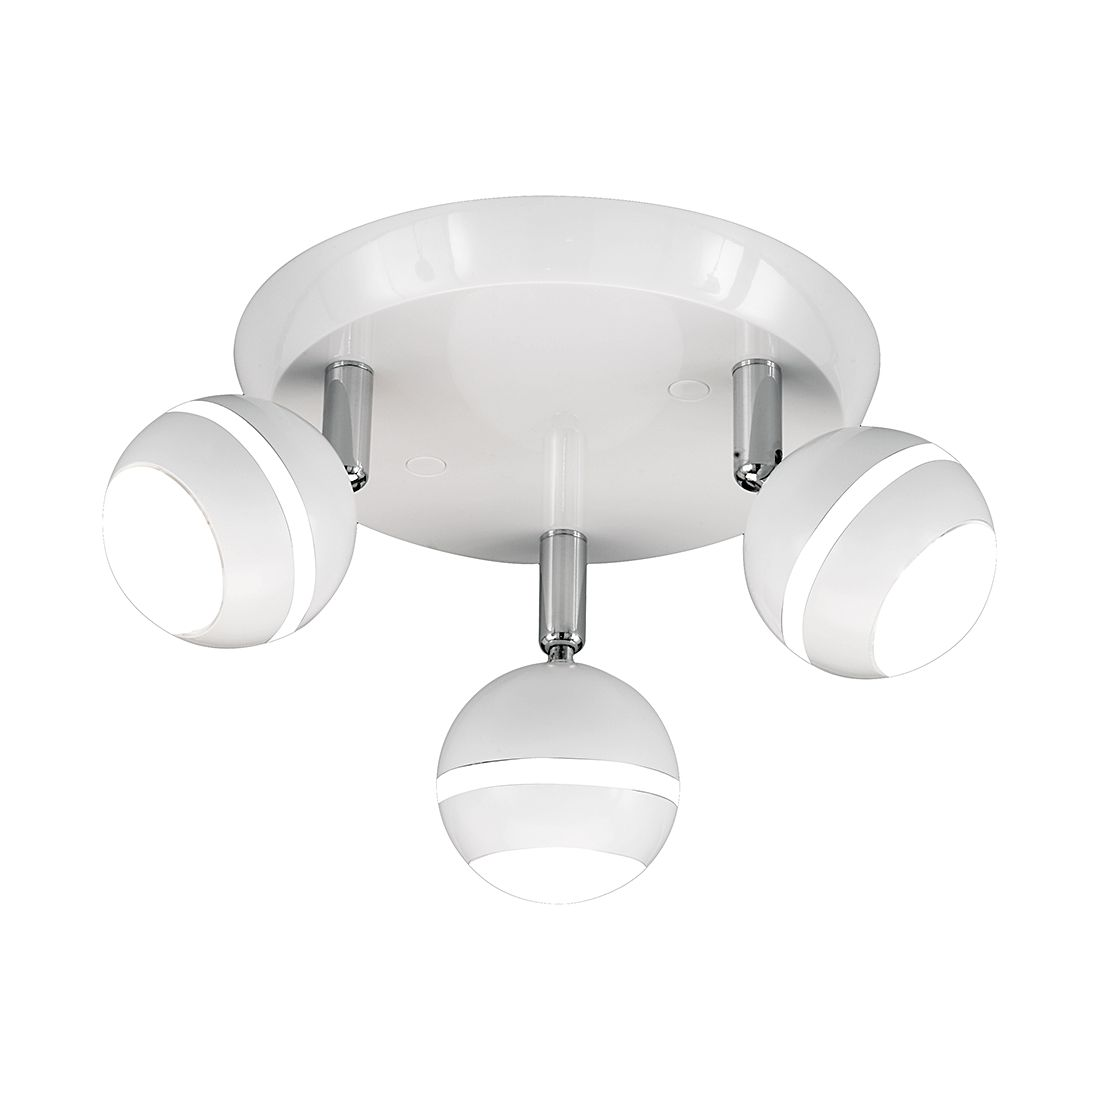 EEK A+, LED-Deckenleuchte Stesi - Weiß - 3-flammig, Trio